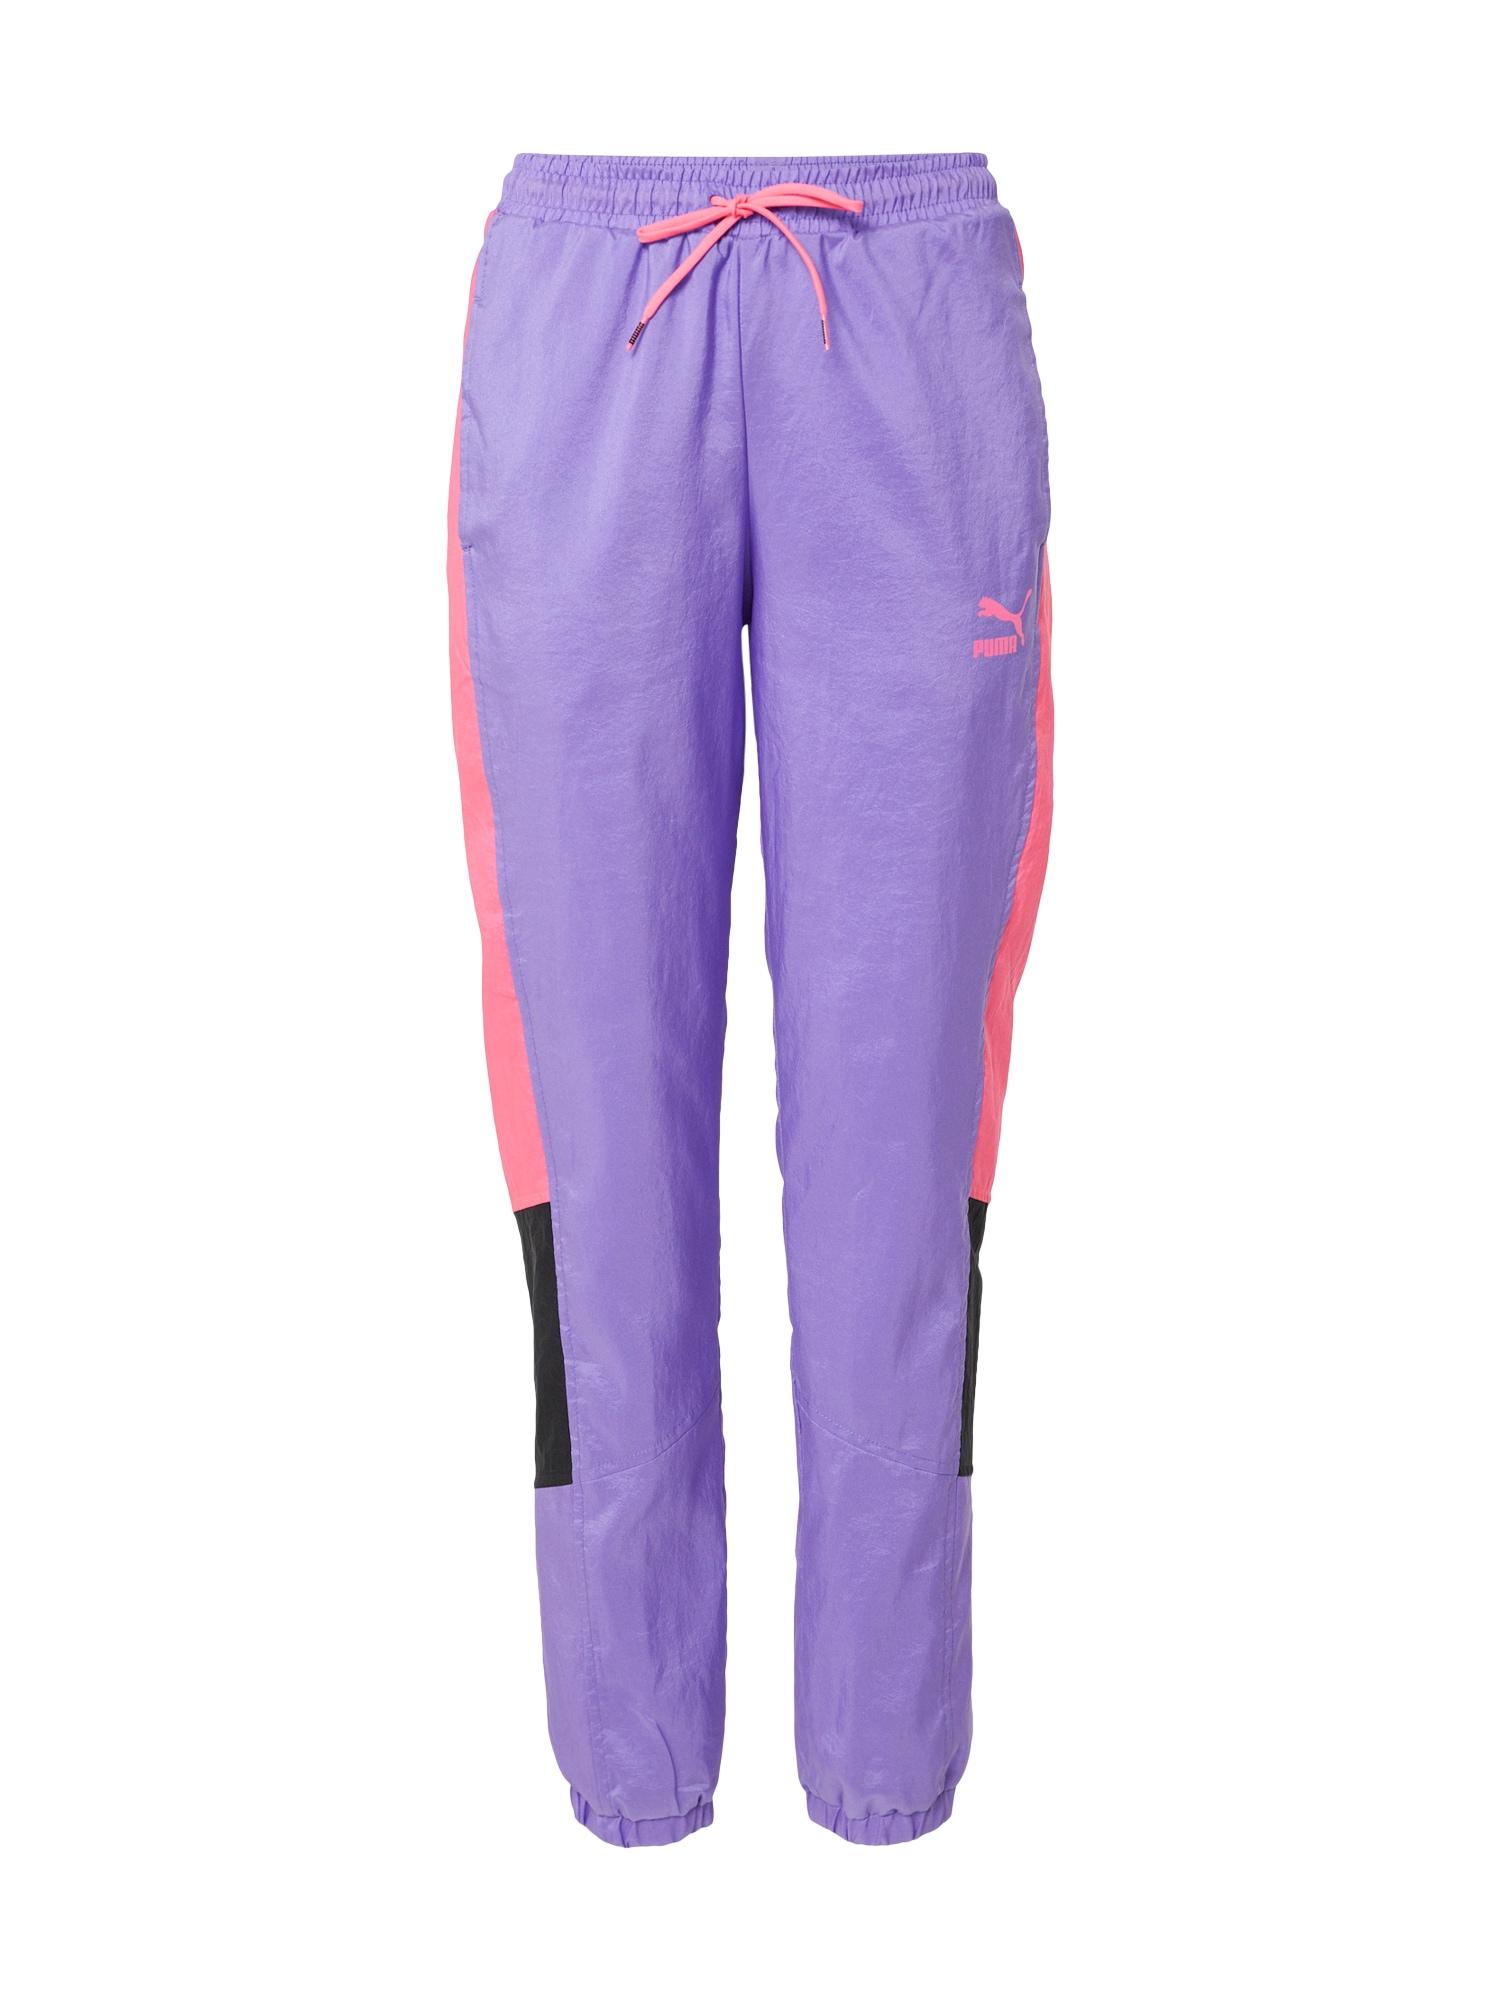 PUMA Nohavice 'Tailored for Sport OG'  ružová / čierna / fialová